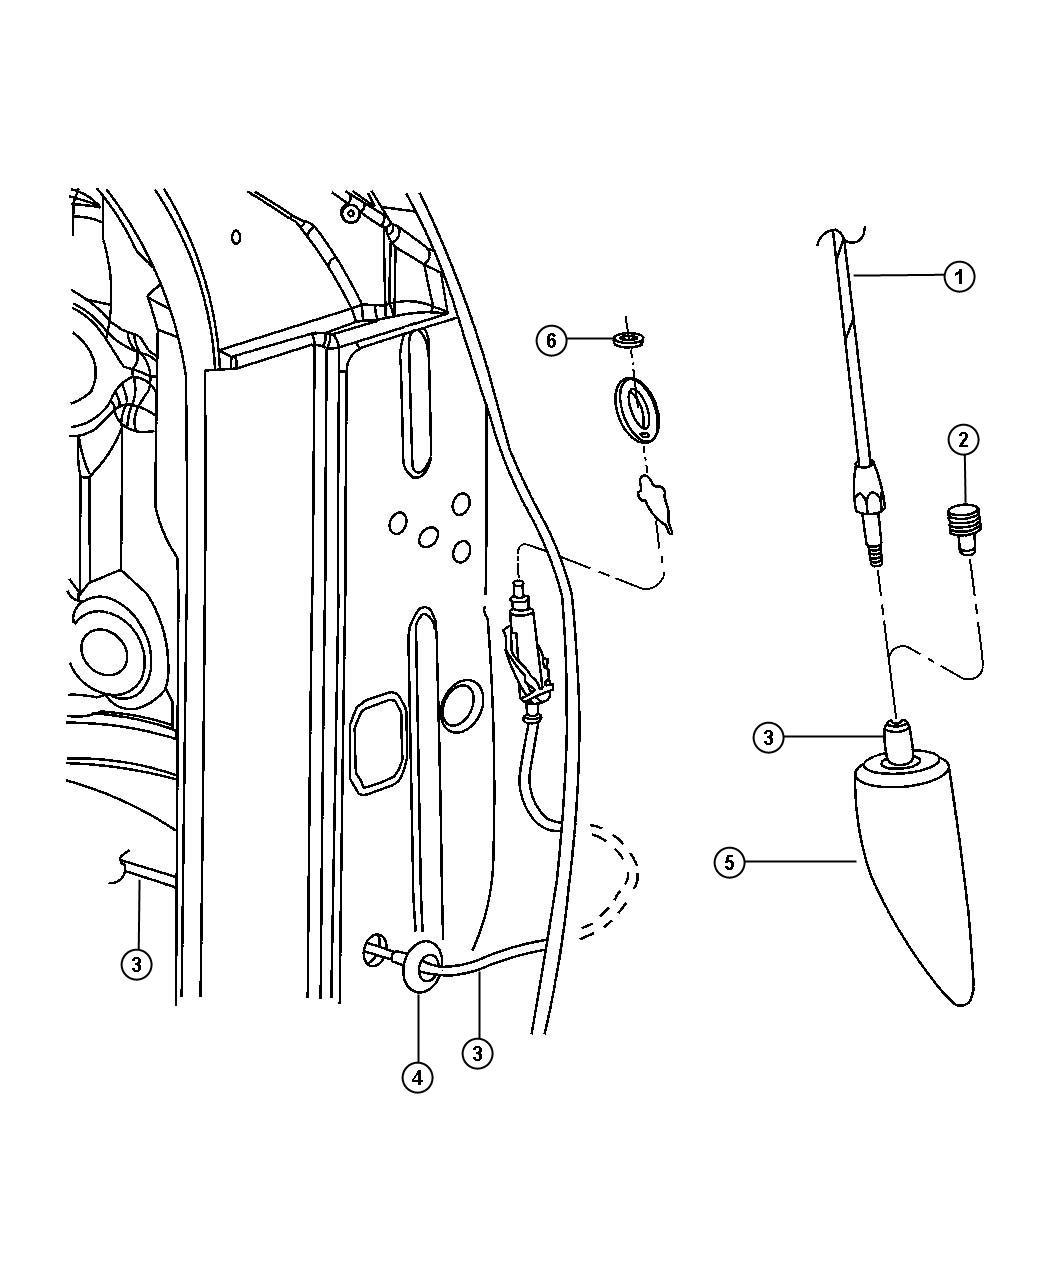 Dodge Ram Cable Antenna Instrutment Panel Displaychsatin